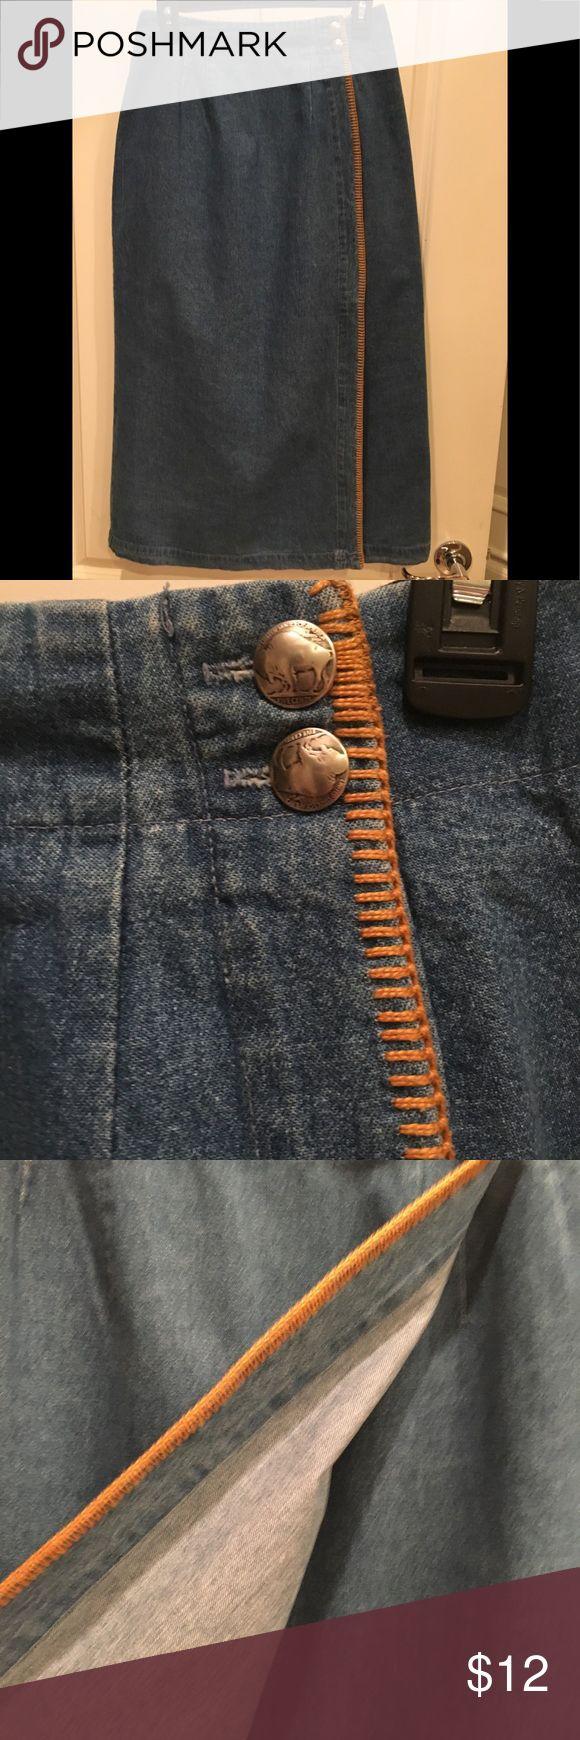 Selling this Ankle Length Blue Denim Wrap Around Skirt on Poshmark! My username is: windycreek. #shopmycloset #poshmark #fashion #shopping #style #forsale #Ruff Hewn #Dresses & Skirts